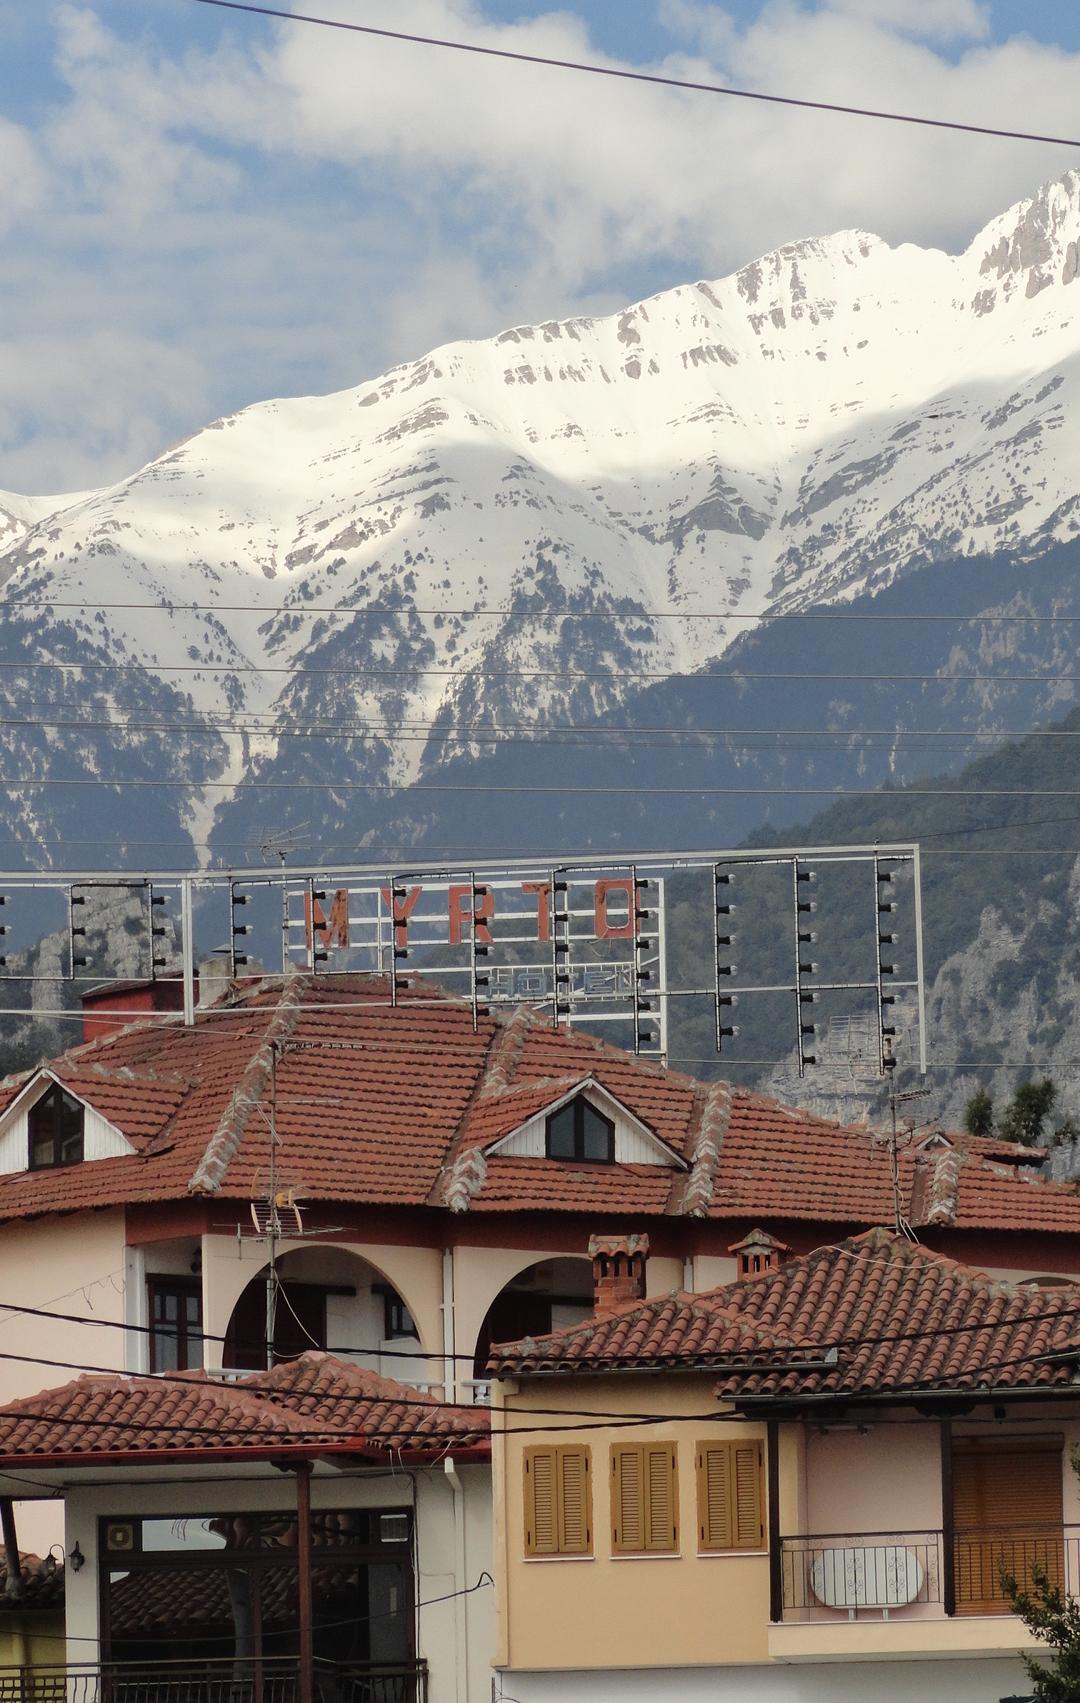 Mount Olympus in Litochoro